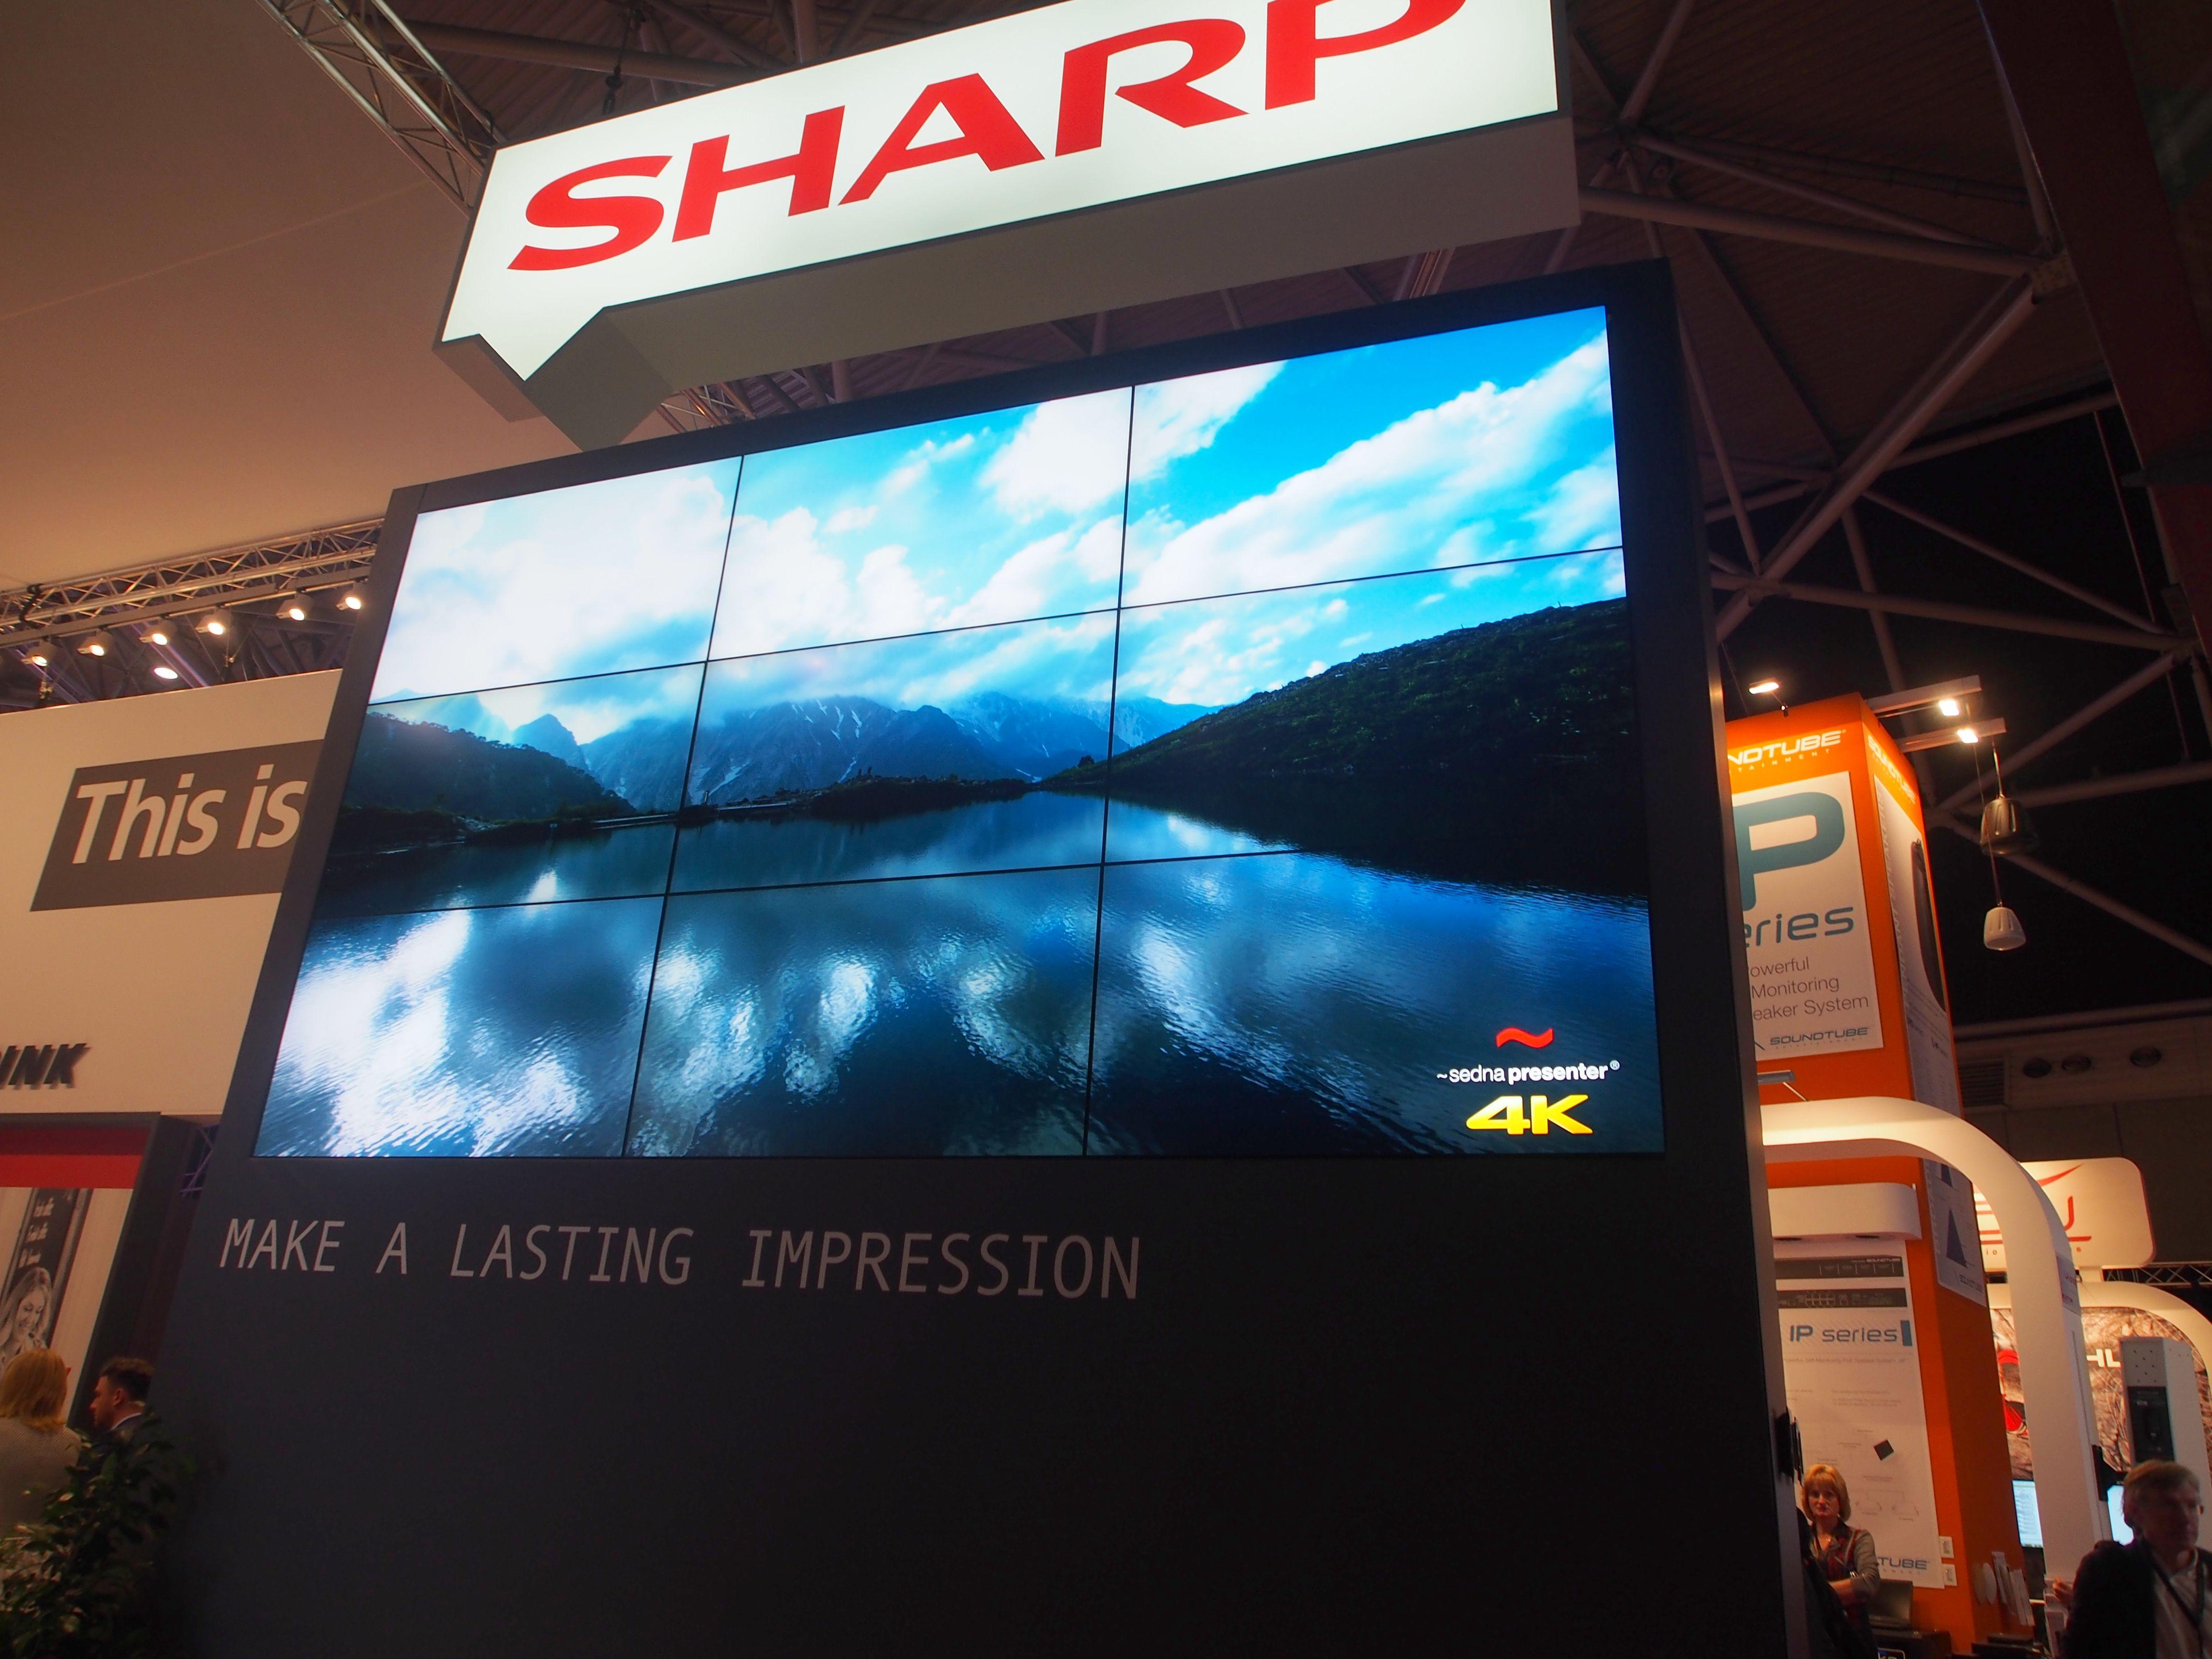 Video Wall am Stand von Sharp (Foto: invidis)